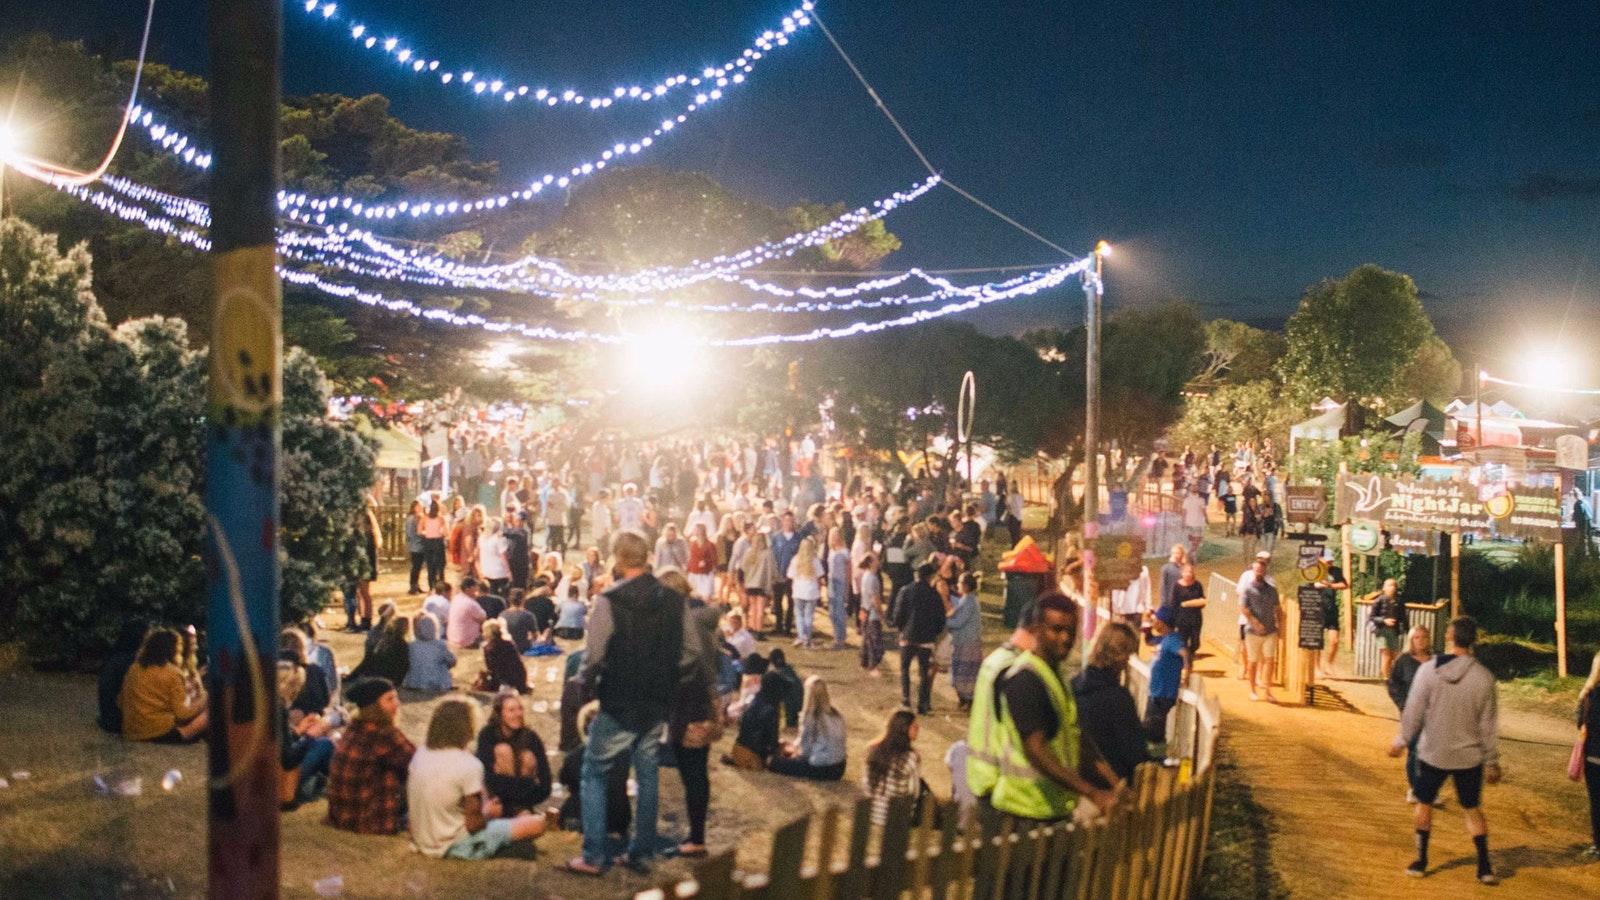 Enter the magical atmosphere of the Nightjar Festival